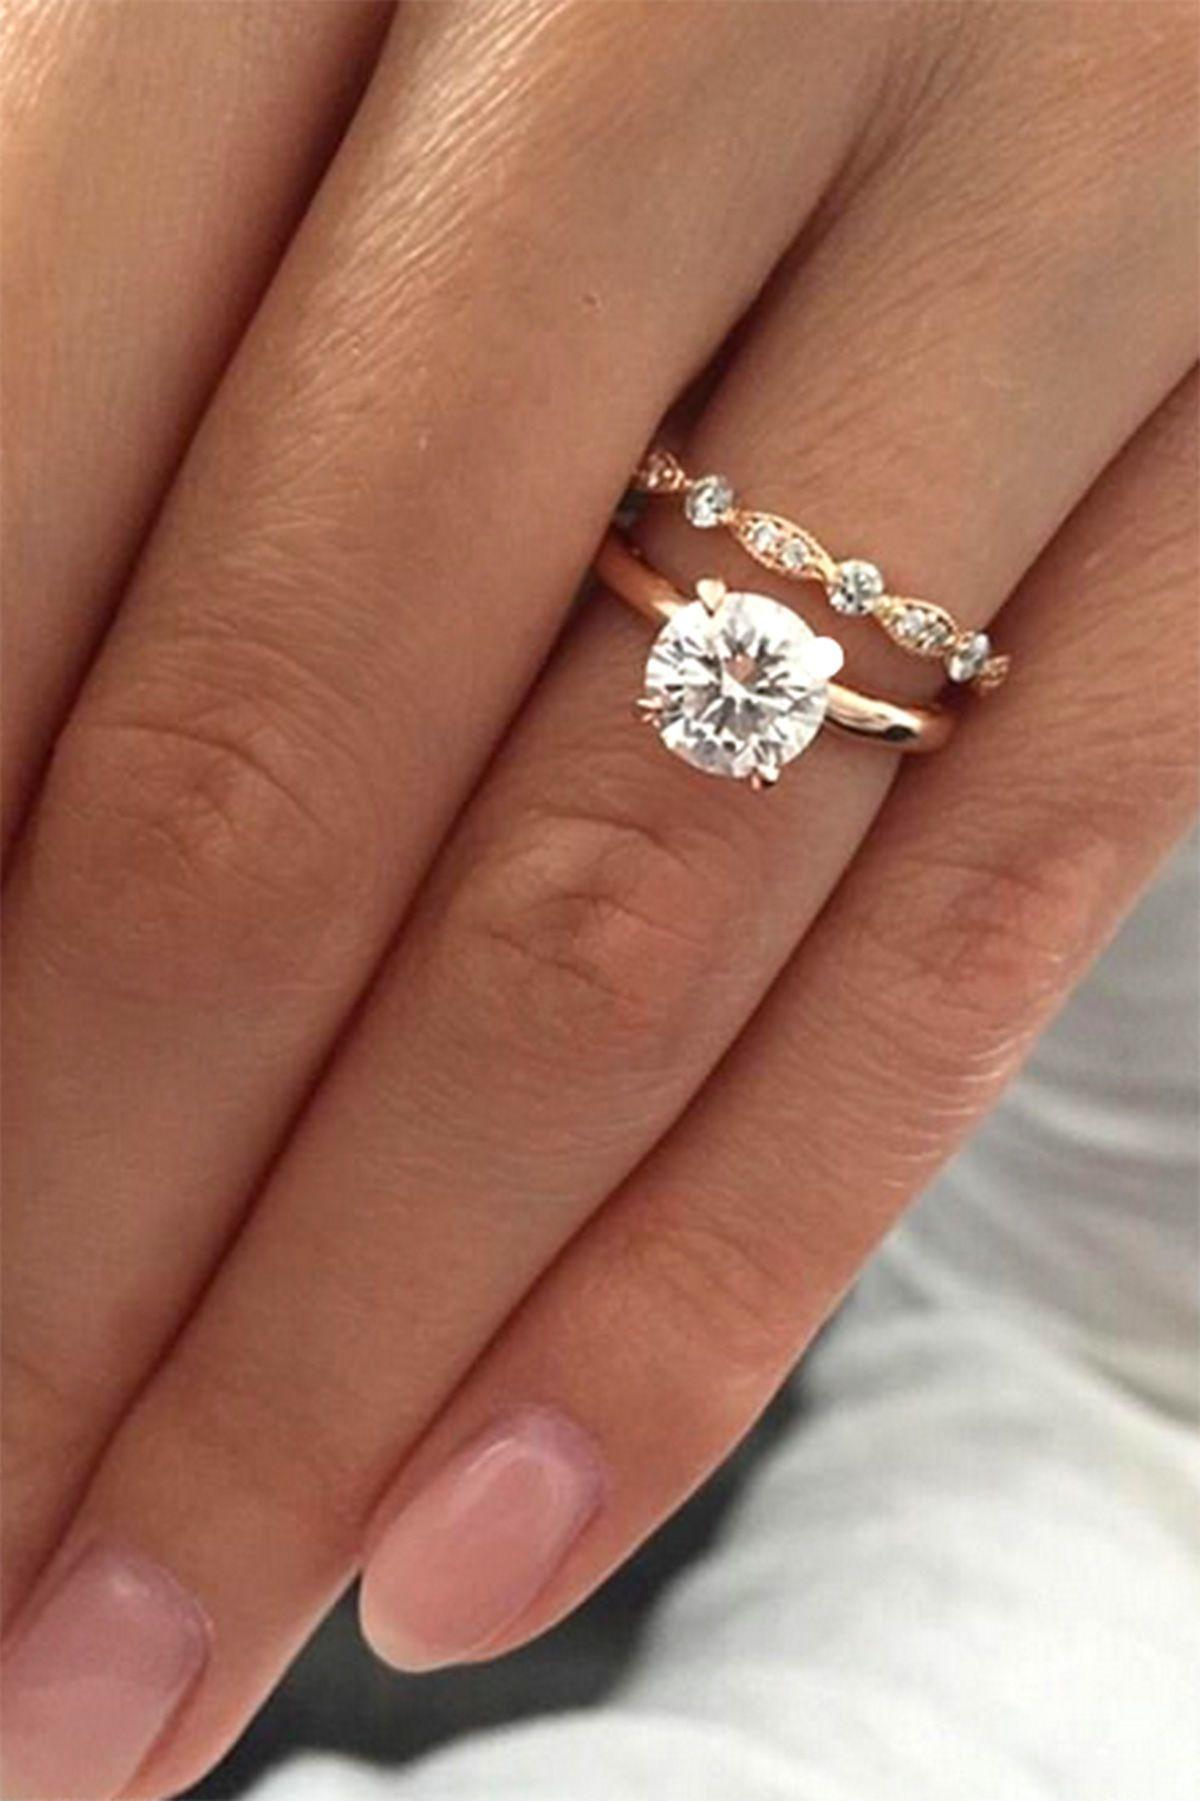 Comprar un anillo de compromiso: debe prestar atención a estas 5 cosas